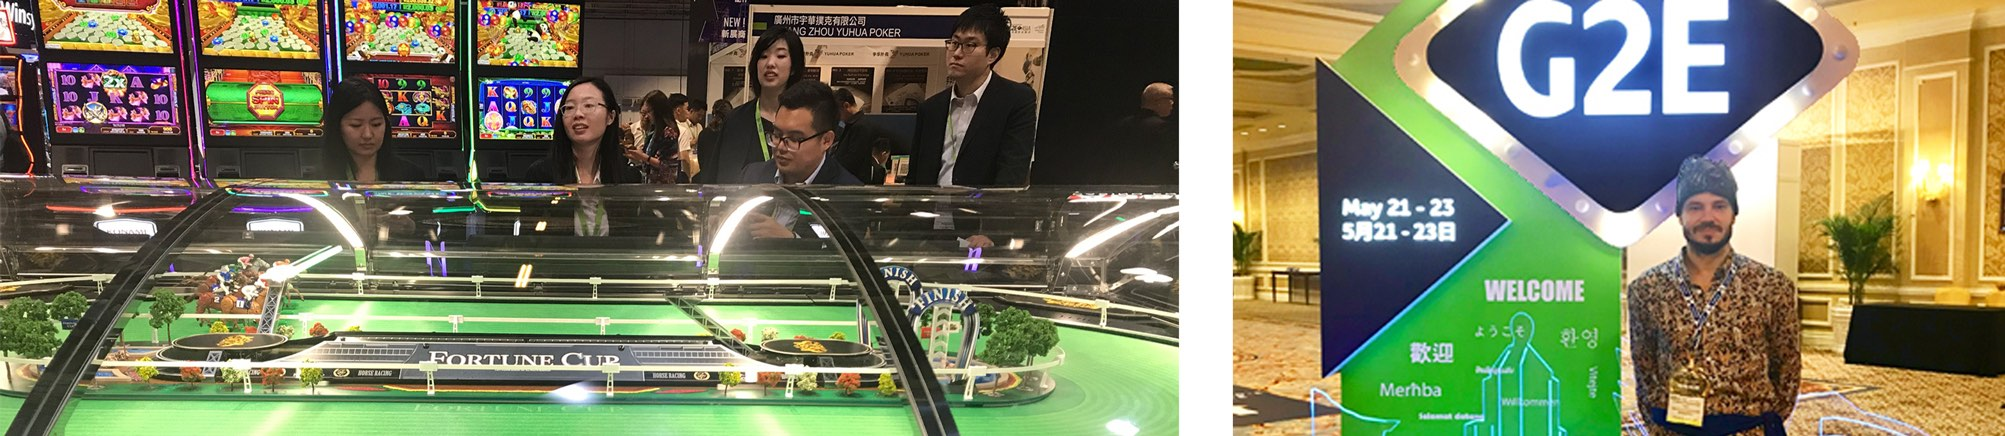 SmartCasinoGuide-tiimi G2E-online-pelikokouksessa